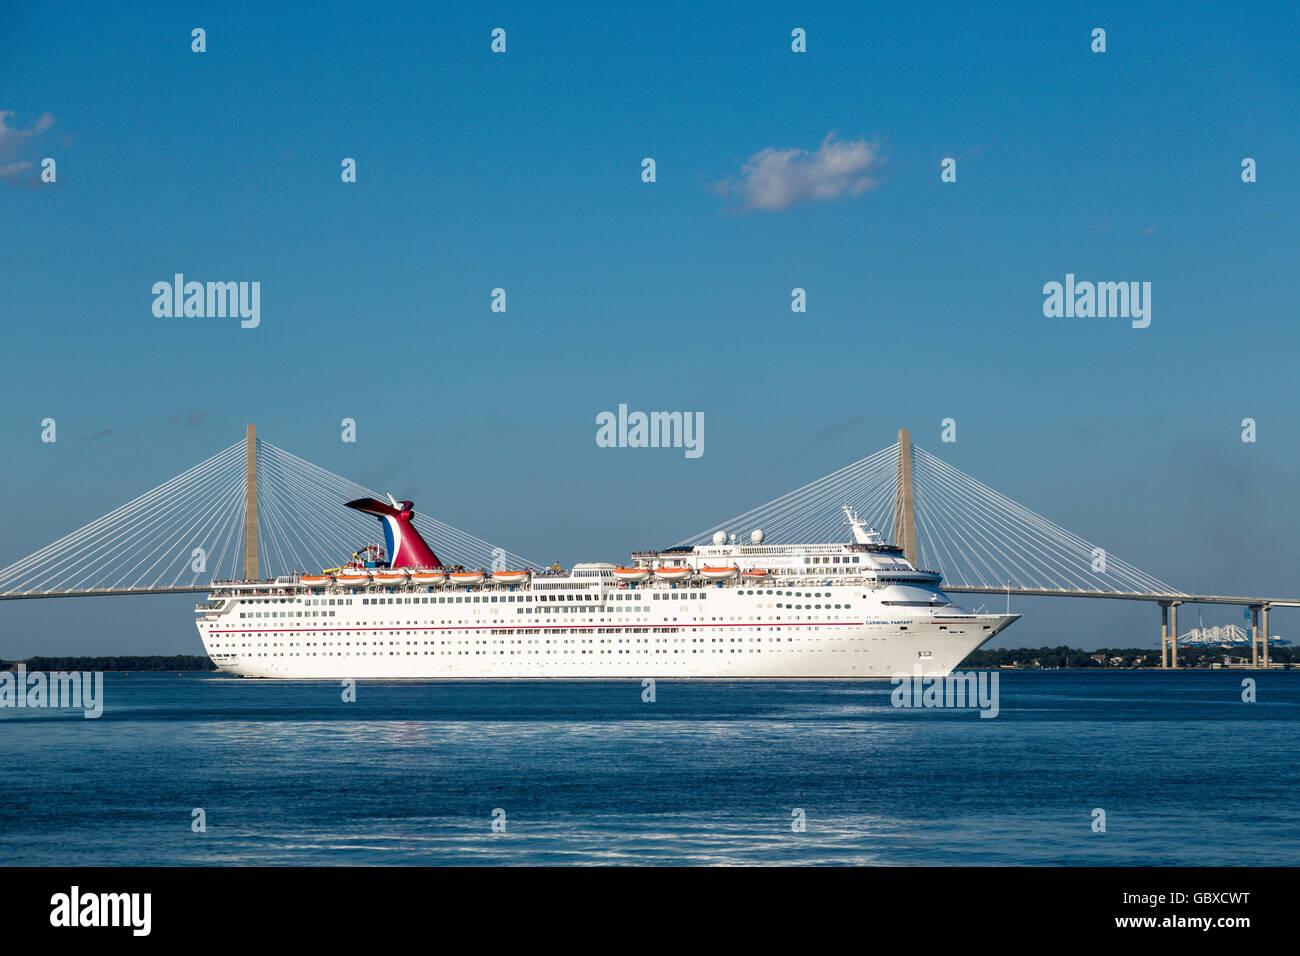 Cruise ship departs Charleston near Arthur Ravenel Jr bridge , SC, USA - Stock Image